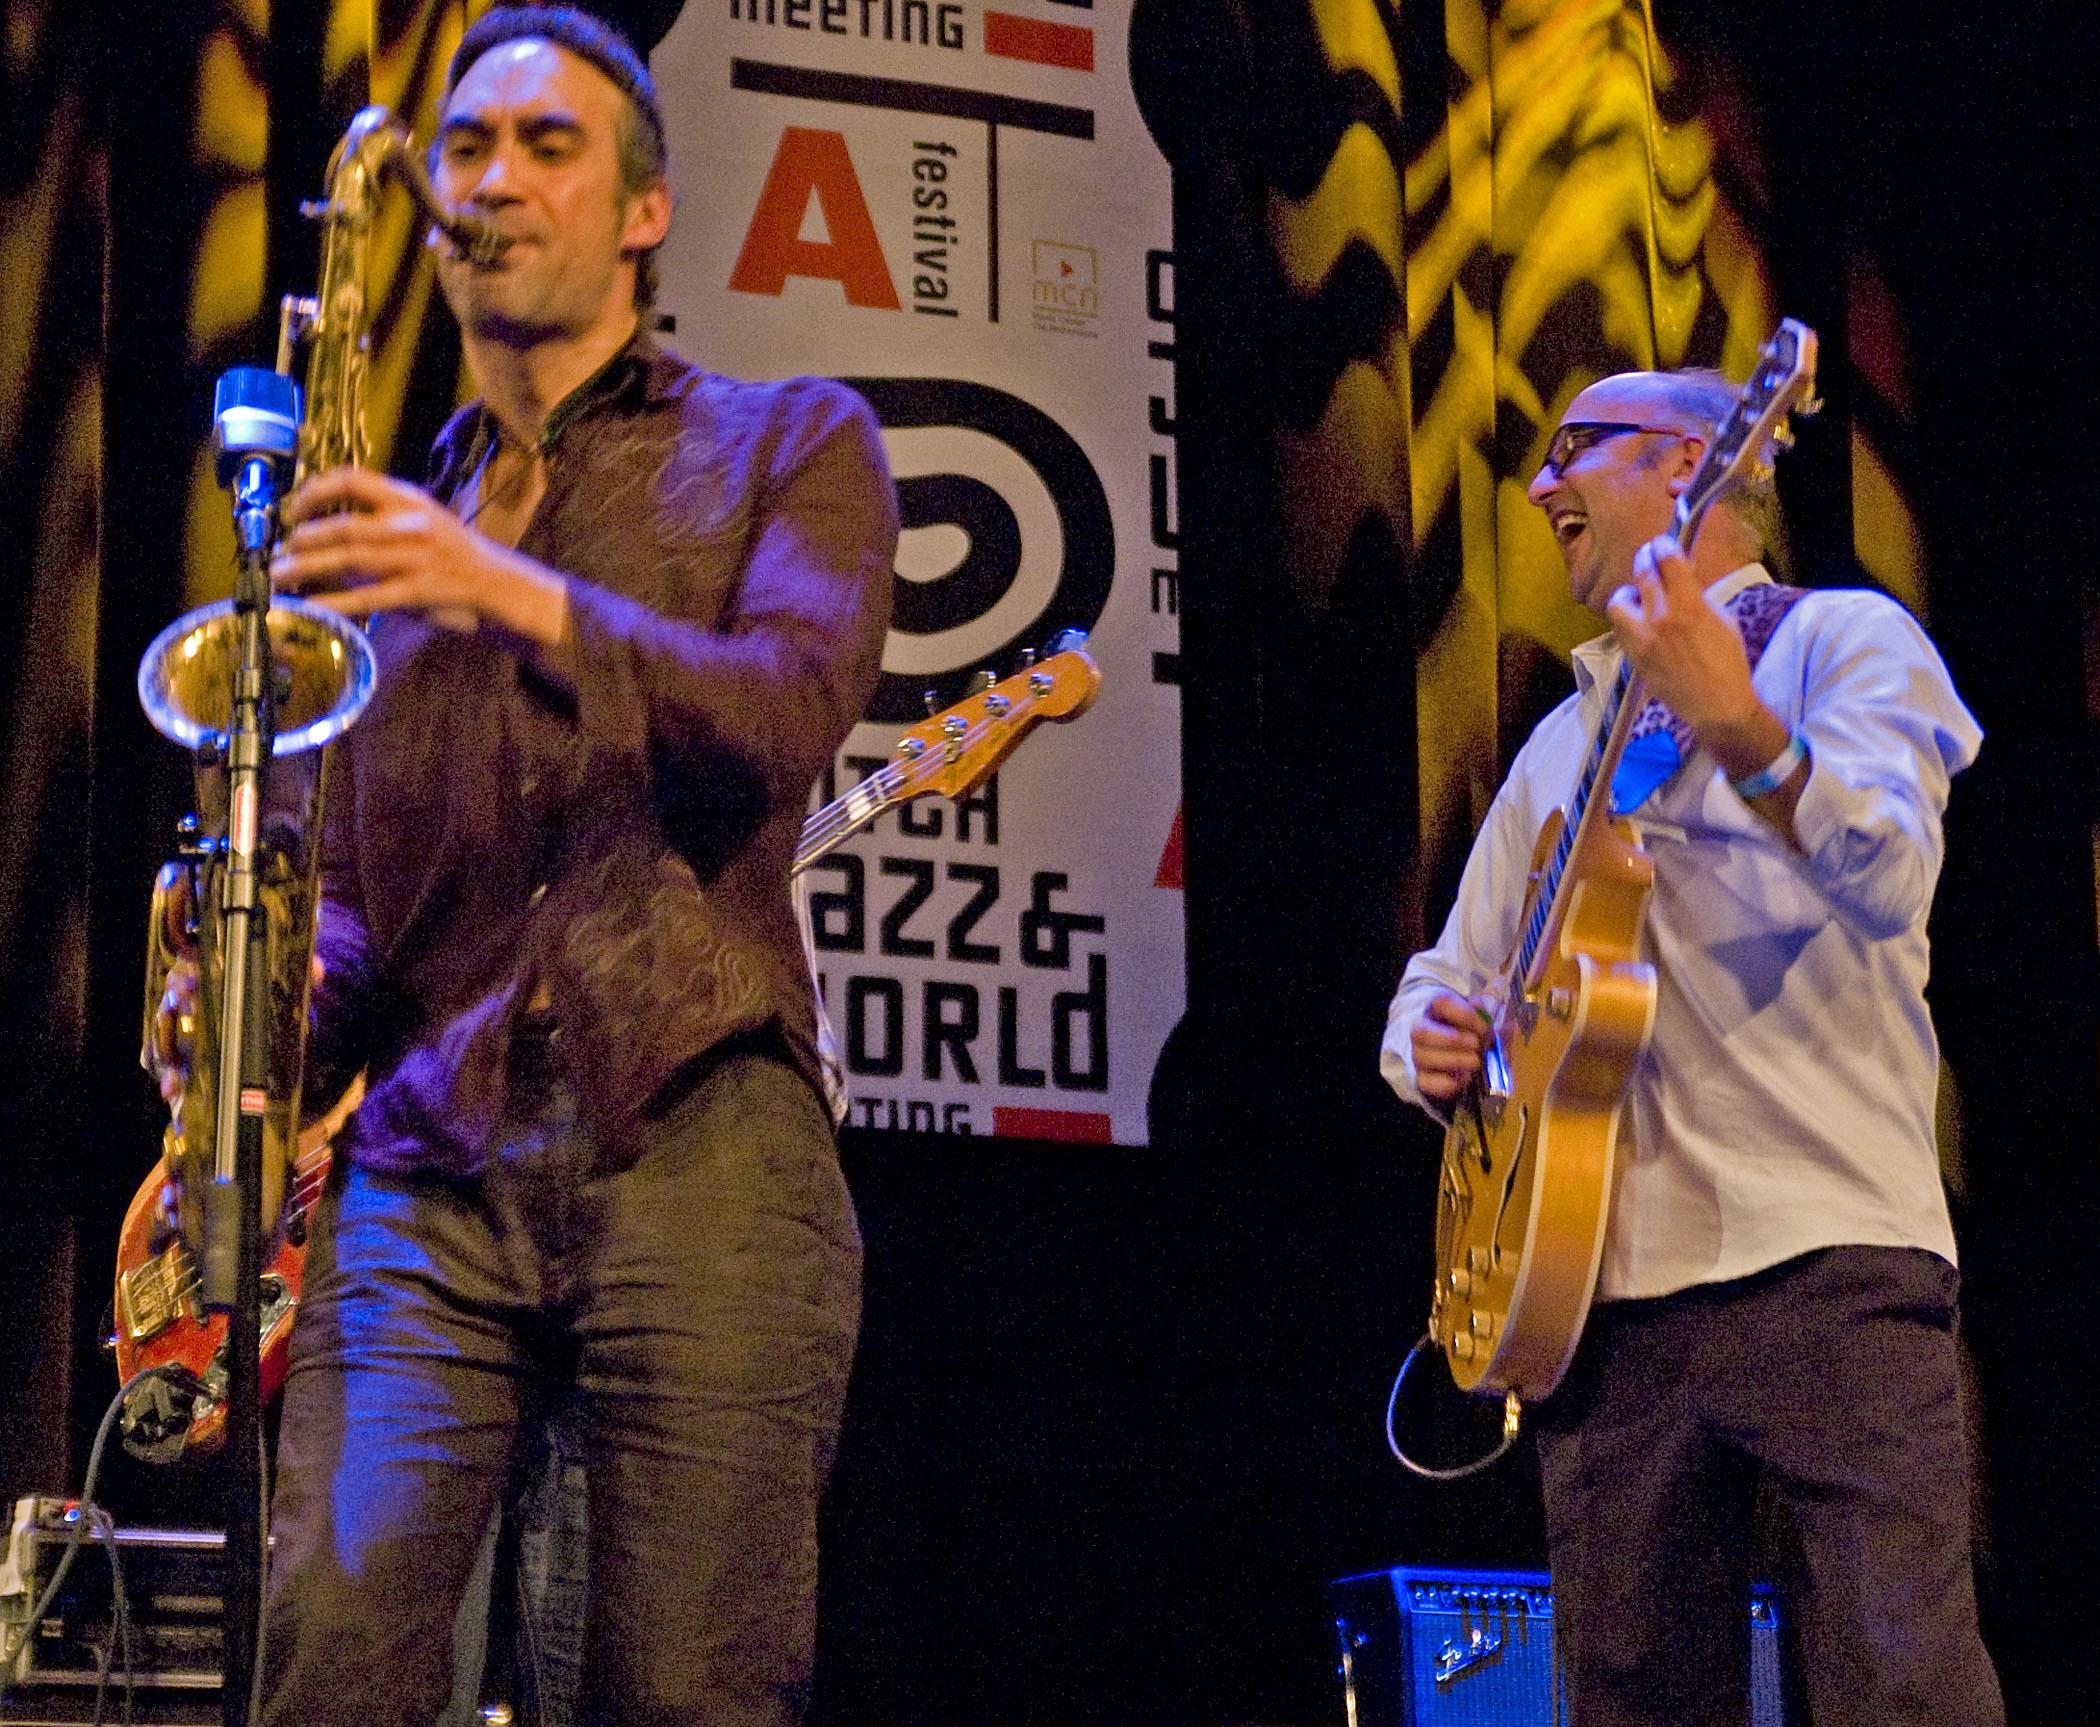 The Ploctones, Dutch Jazz & World Meeting, December 2, 2010